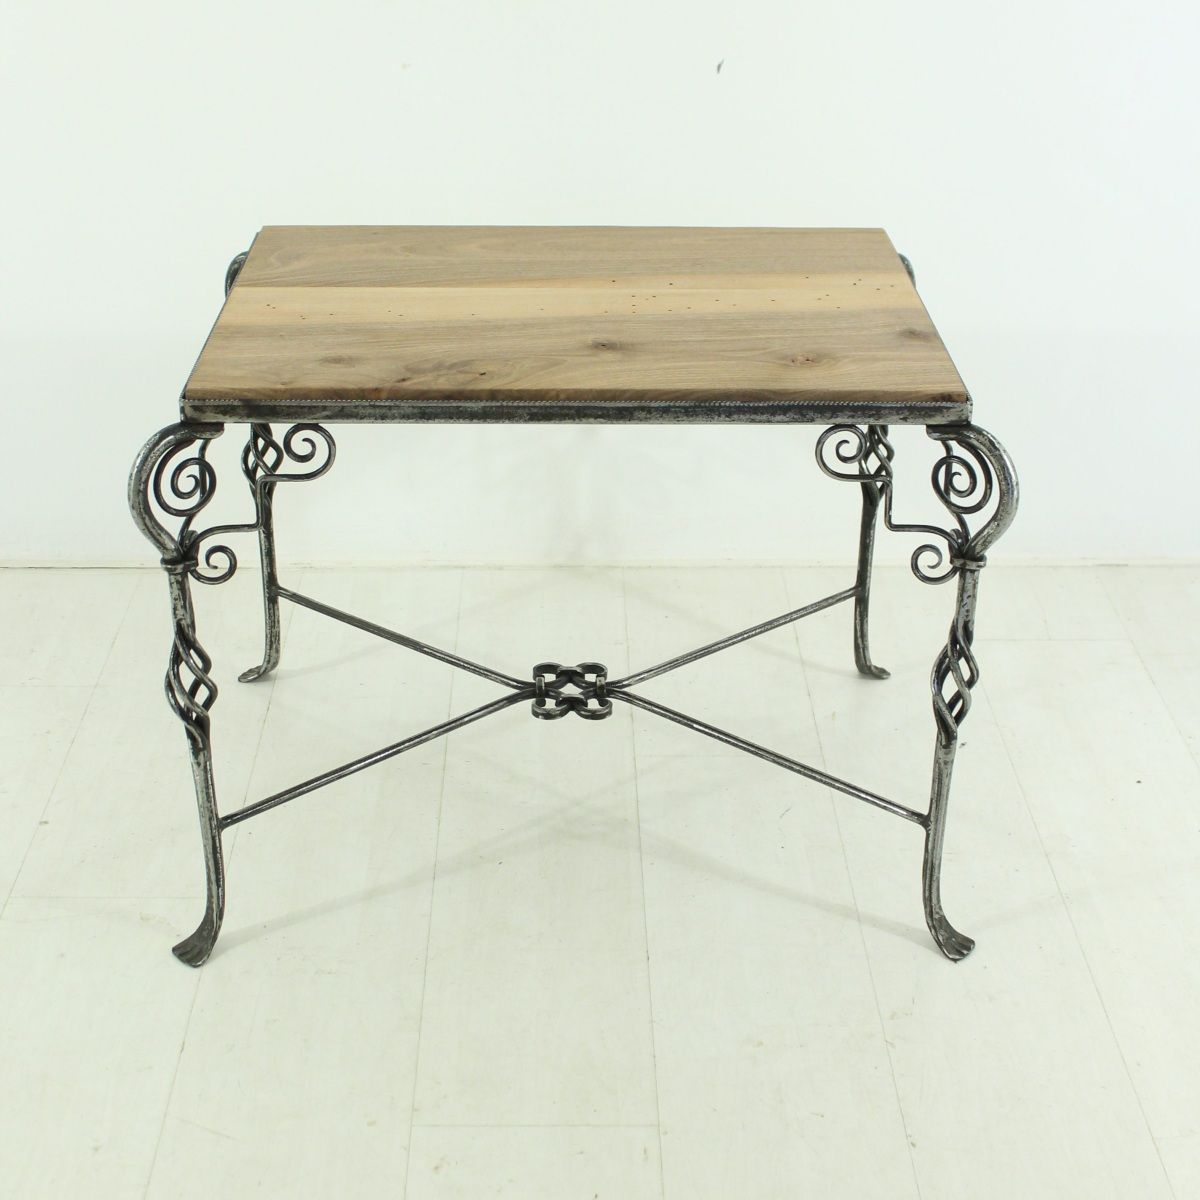 petite table basse 1930s en vente sur pamono. Black Bedroom Furniture Sets. Home Design Ideas